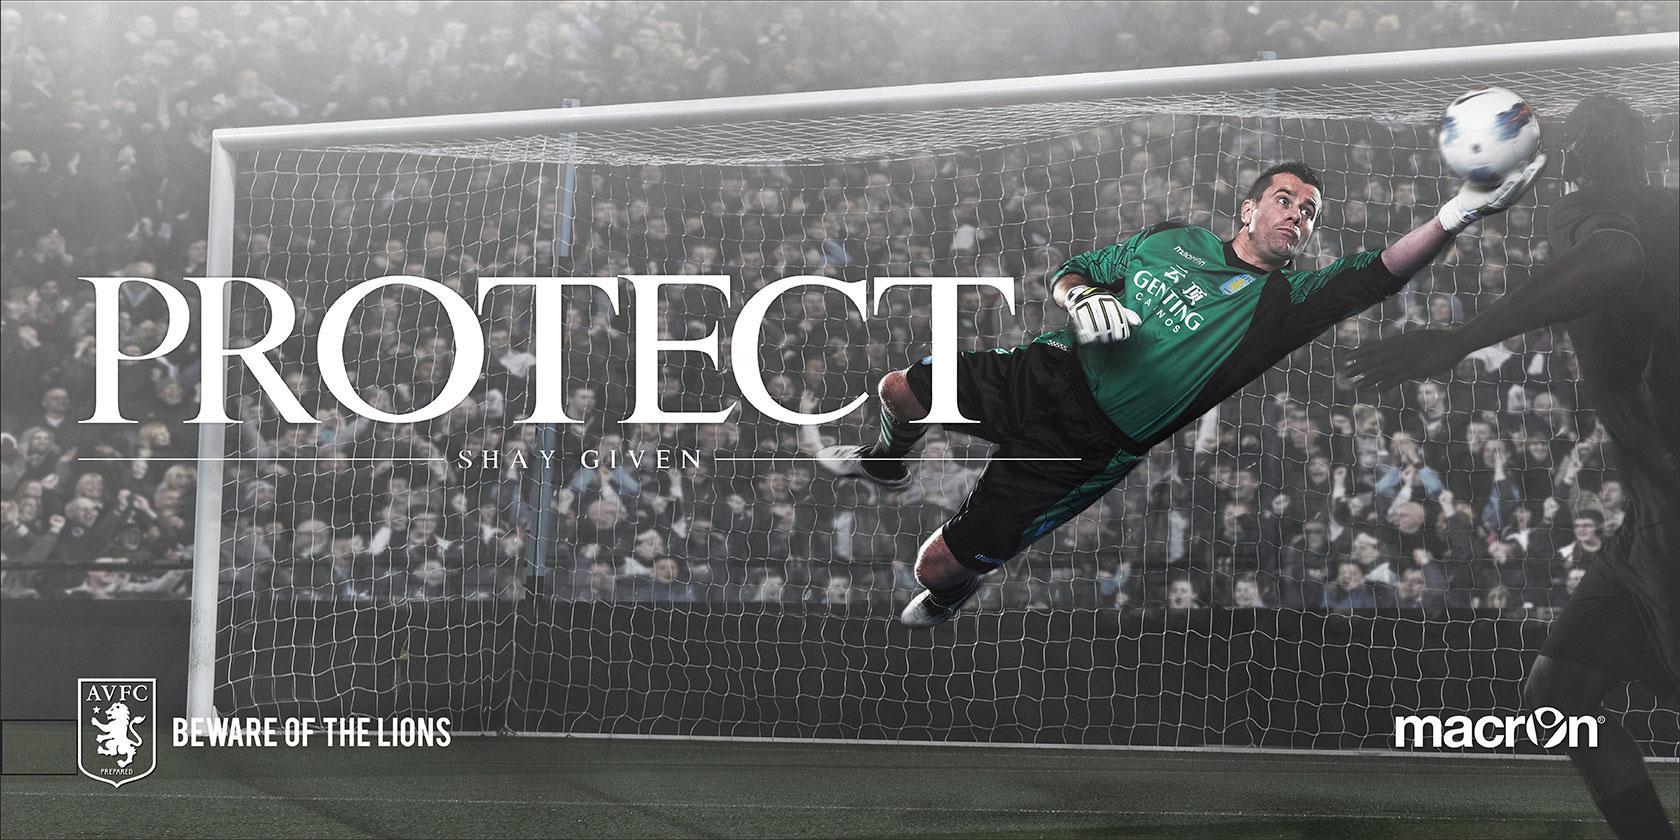 Aston Villa FC Outdoor Ad -  Beware Of The Lions, 6